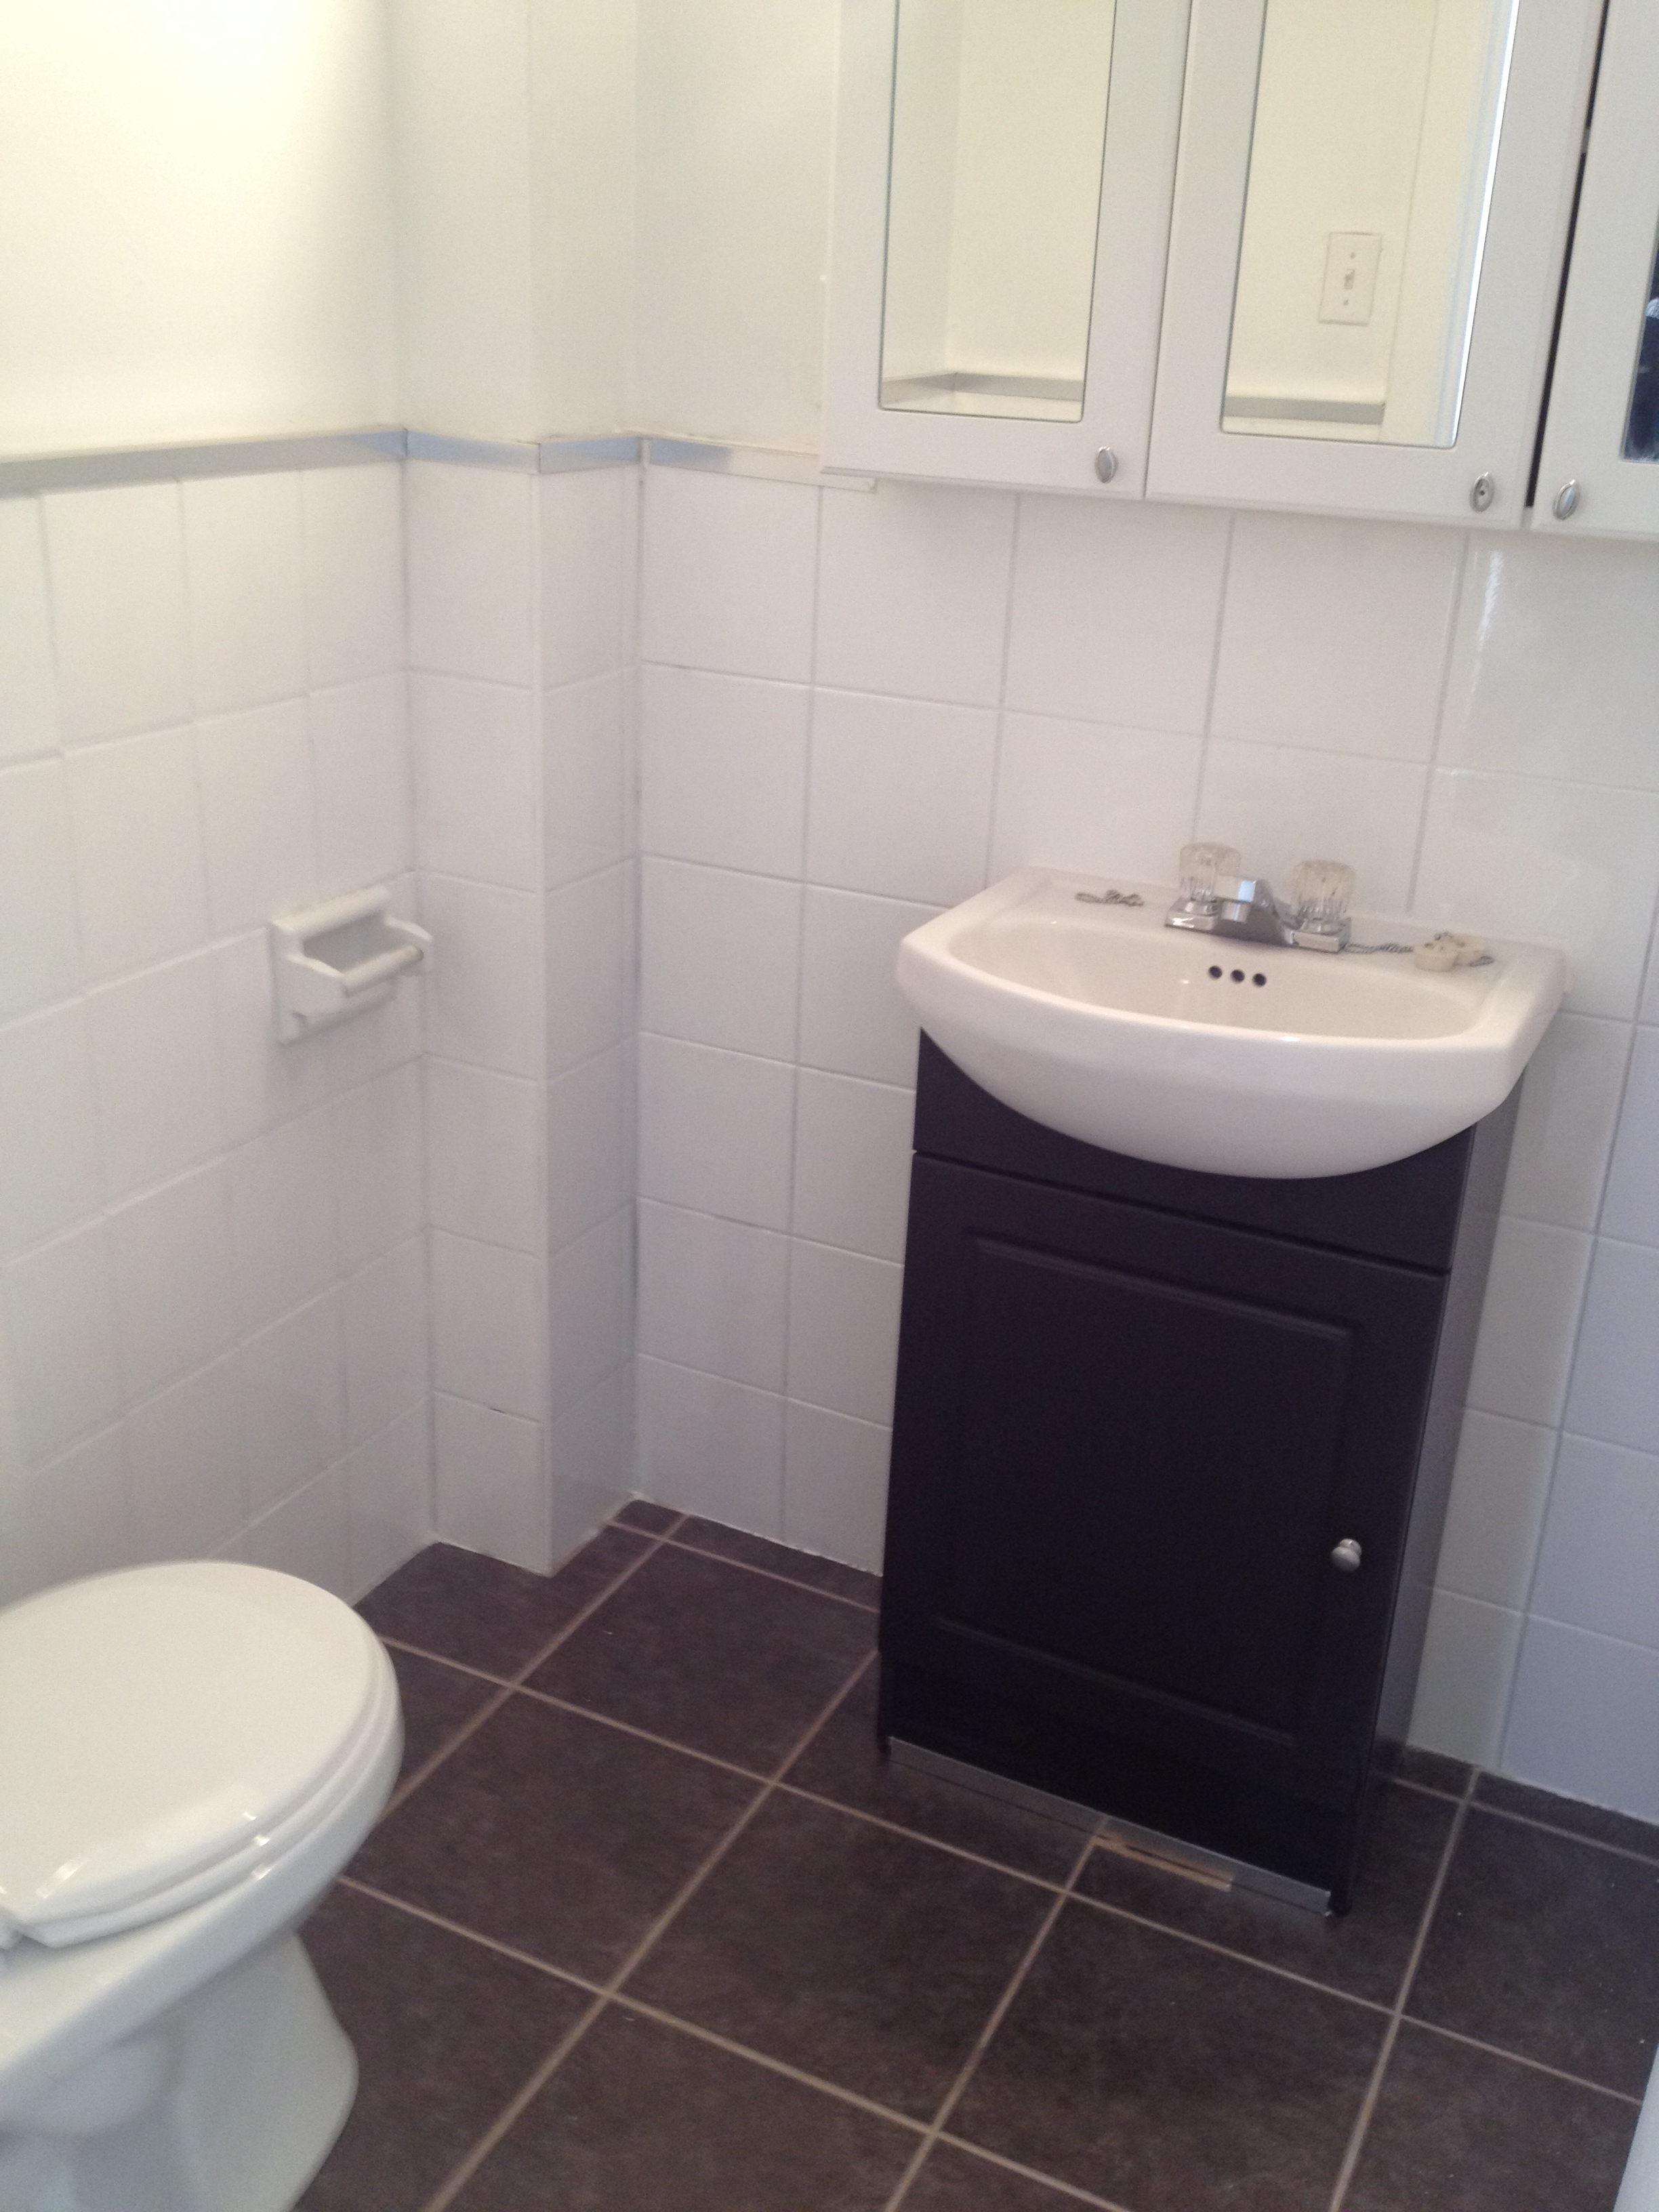 2 bedroom Apartments for rent in Cote-des-Neiges at 2615-2625 Kent - Photo 11 - RentersPages – L20674